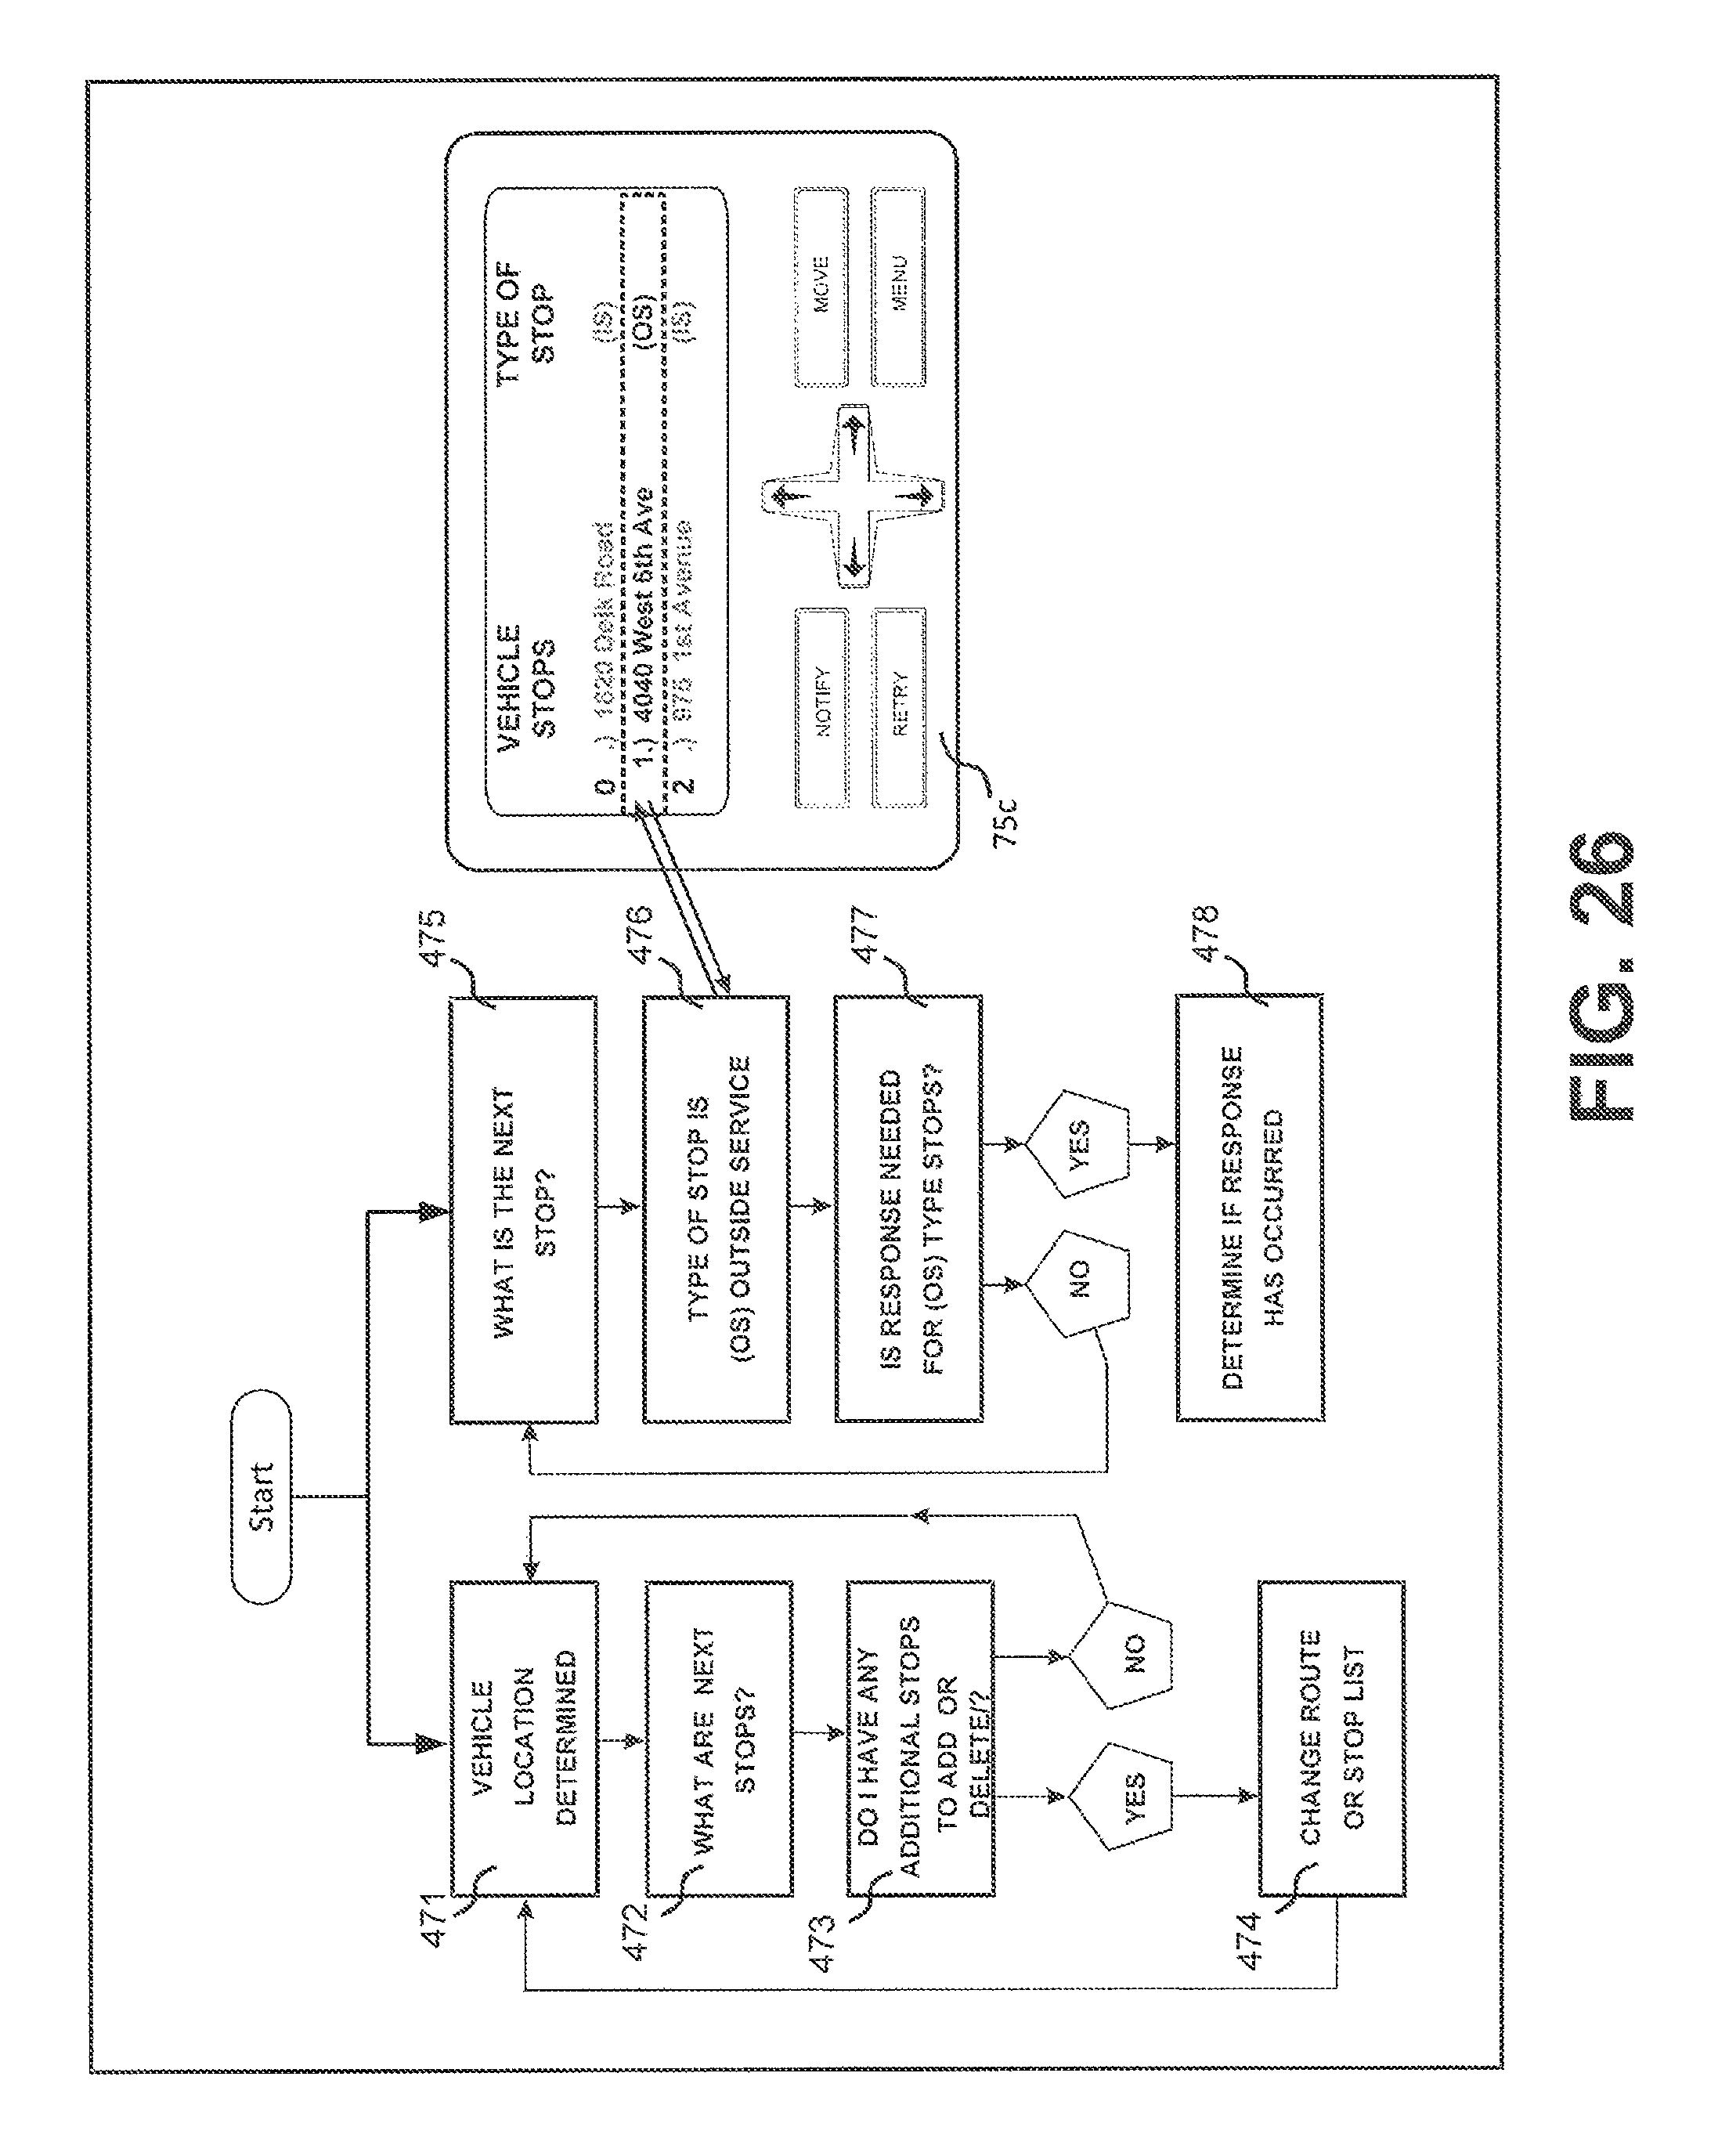 patent us 9679322 b2